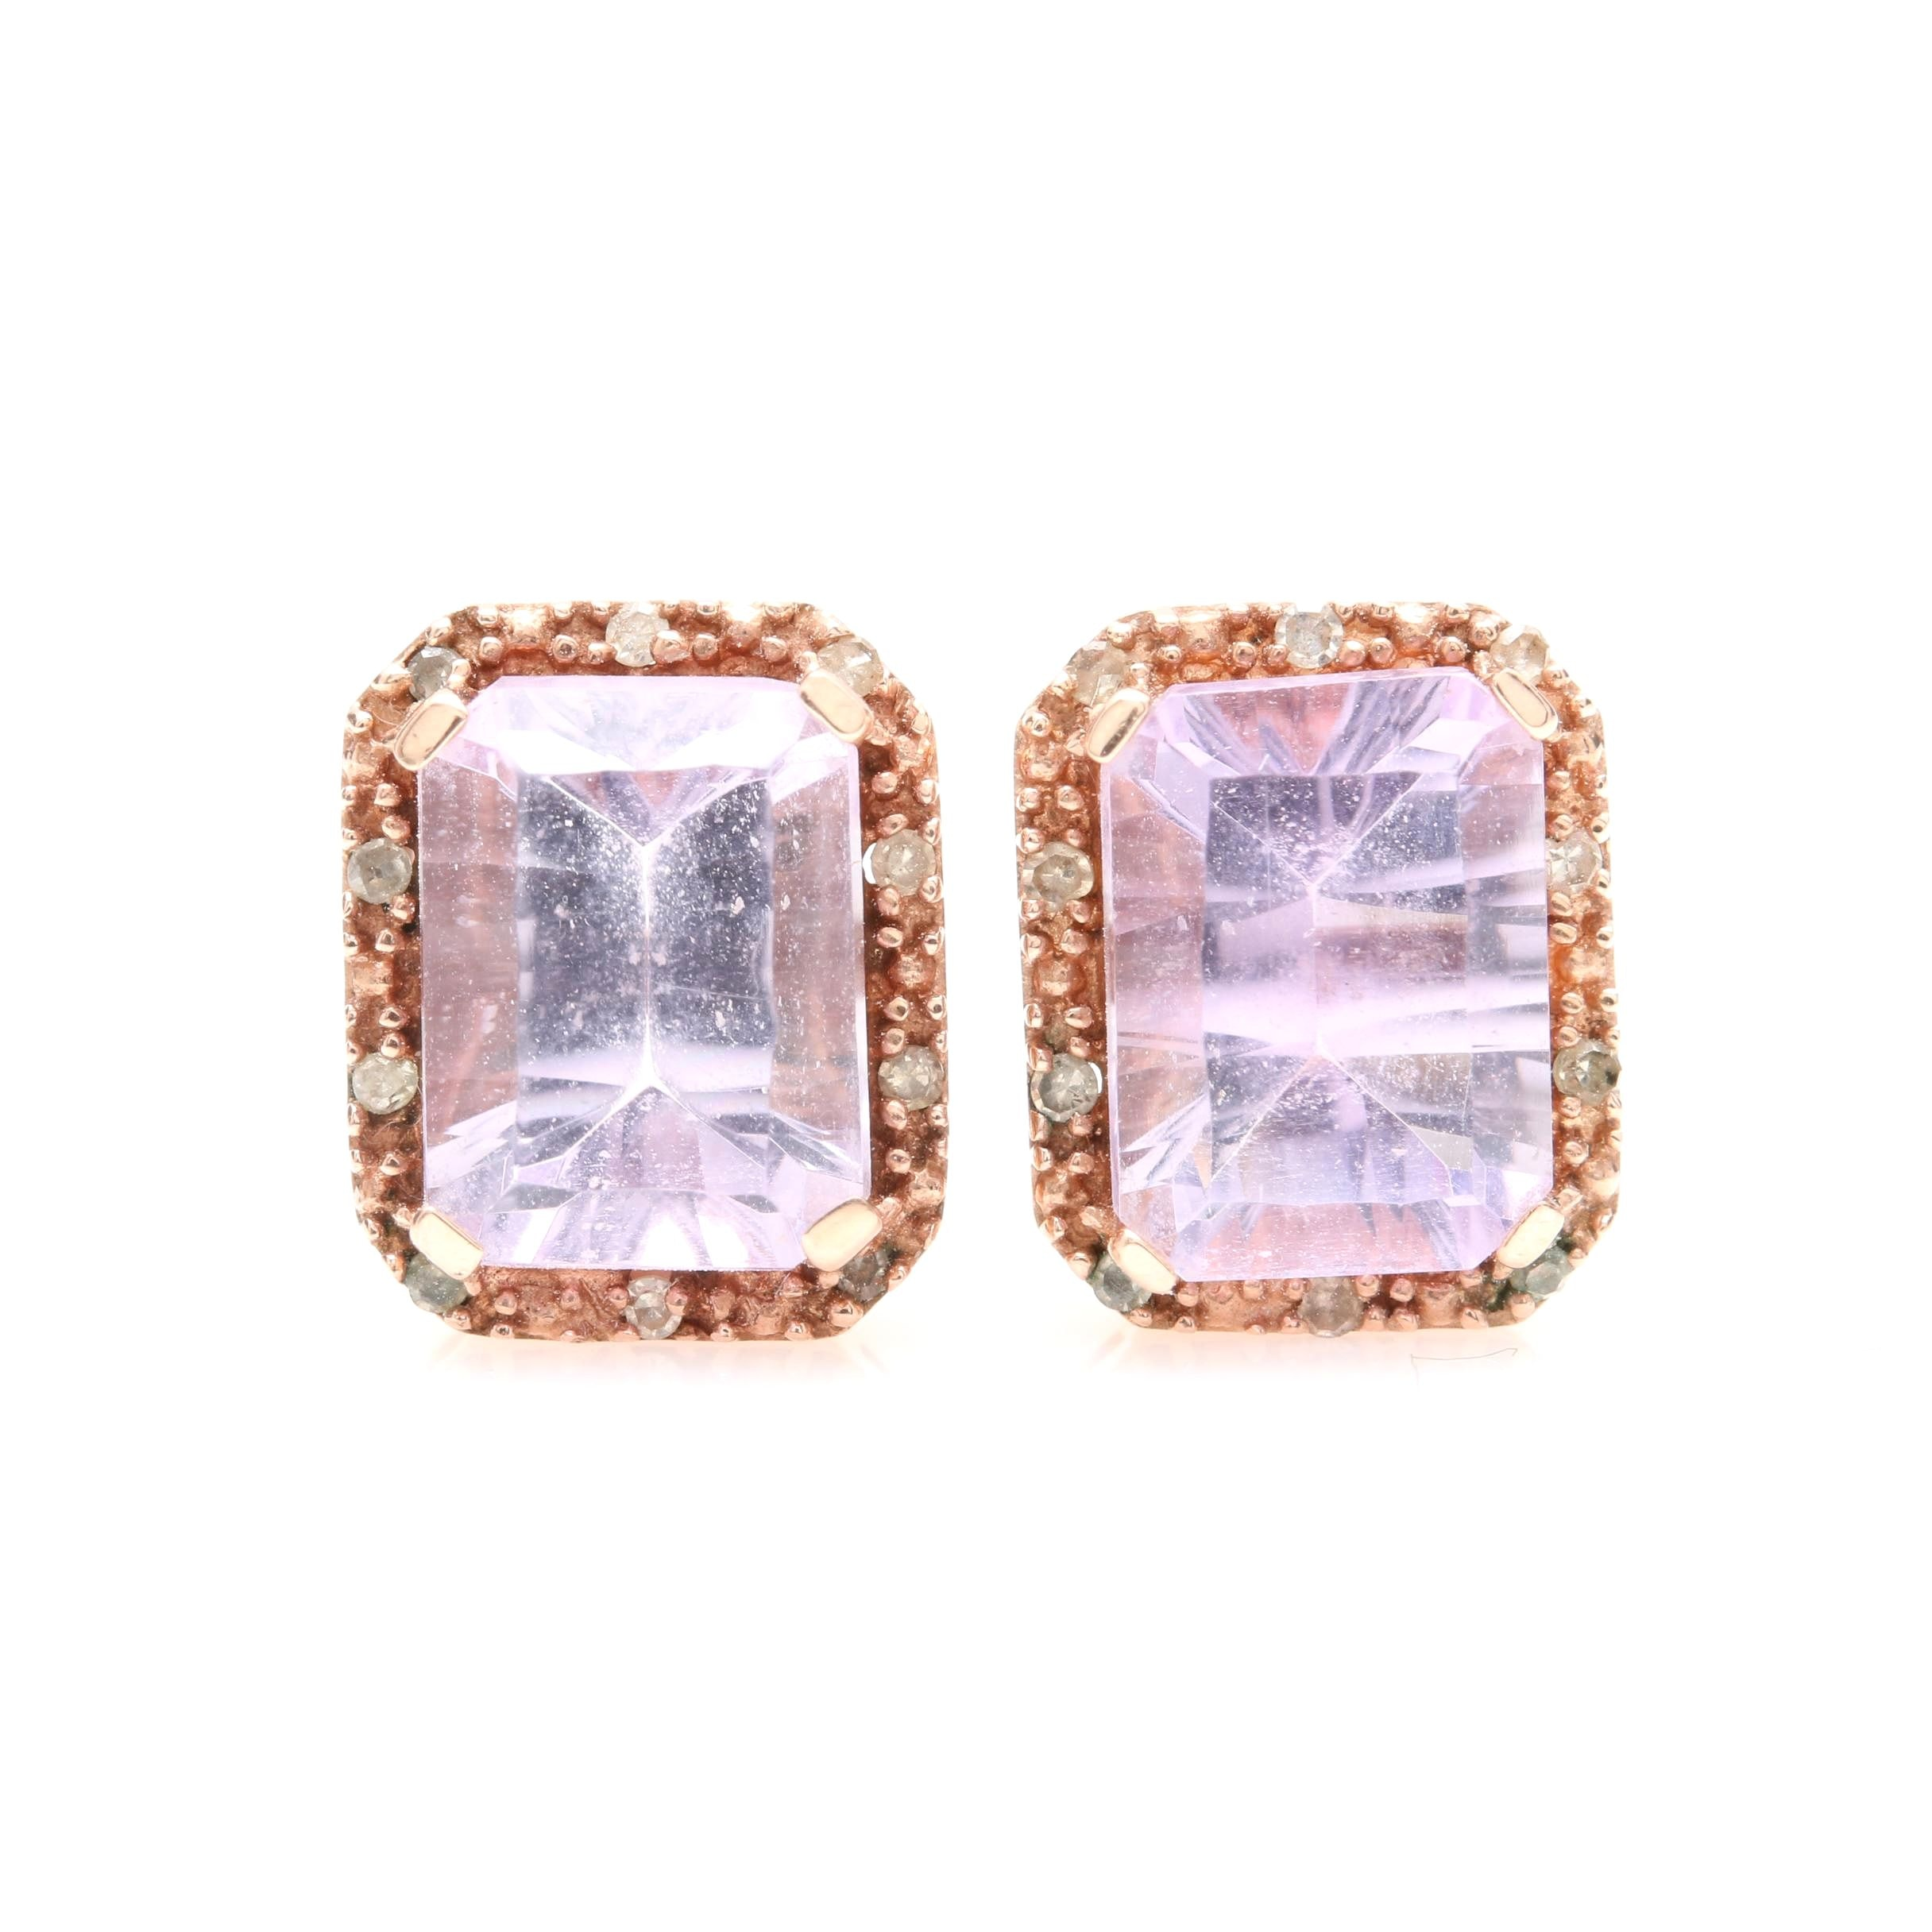 10K Rose Gold Amethyst and Diamond Stud Earrings